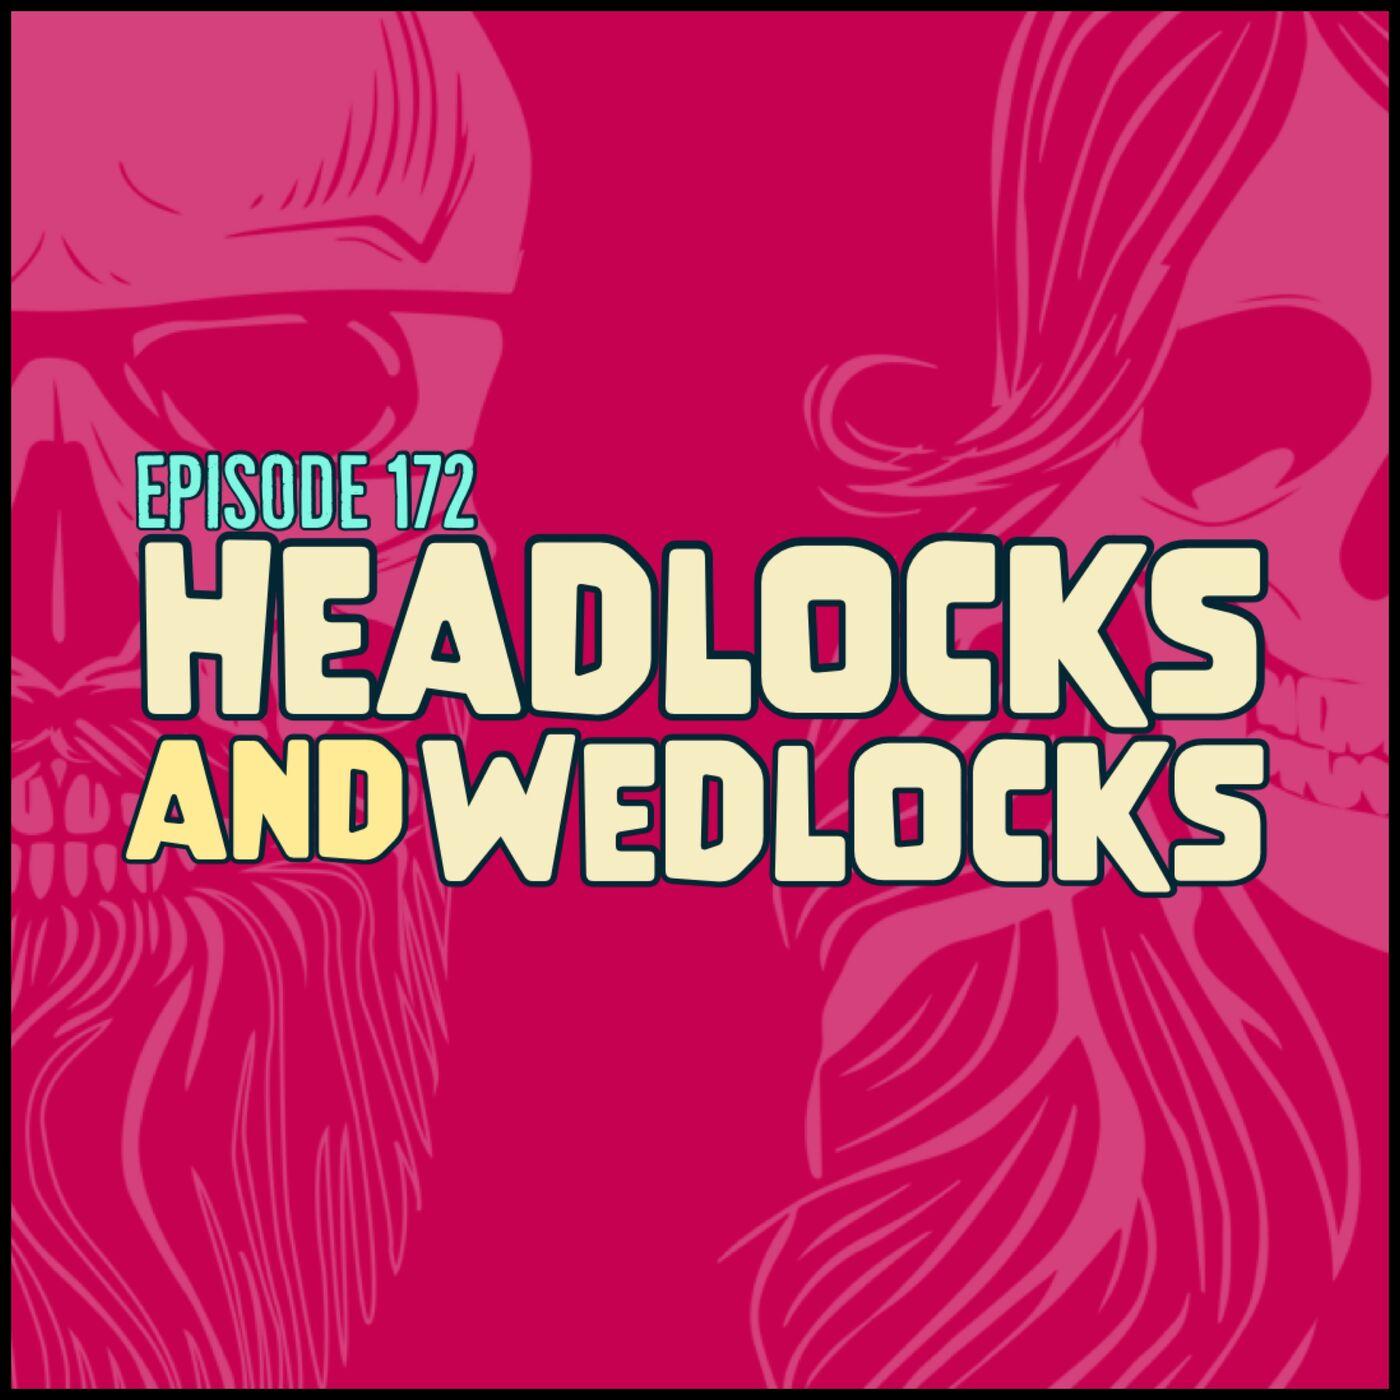 Episode 172: Headlocks and Wedlocks